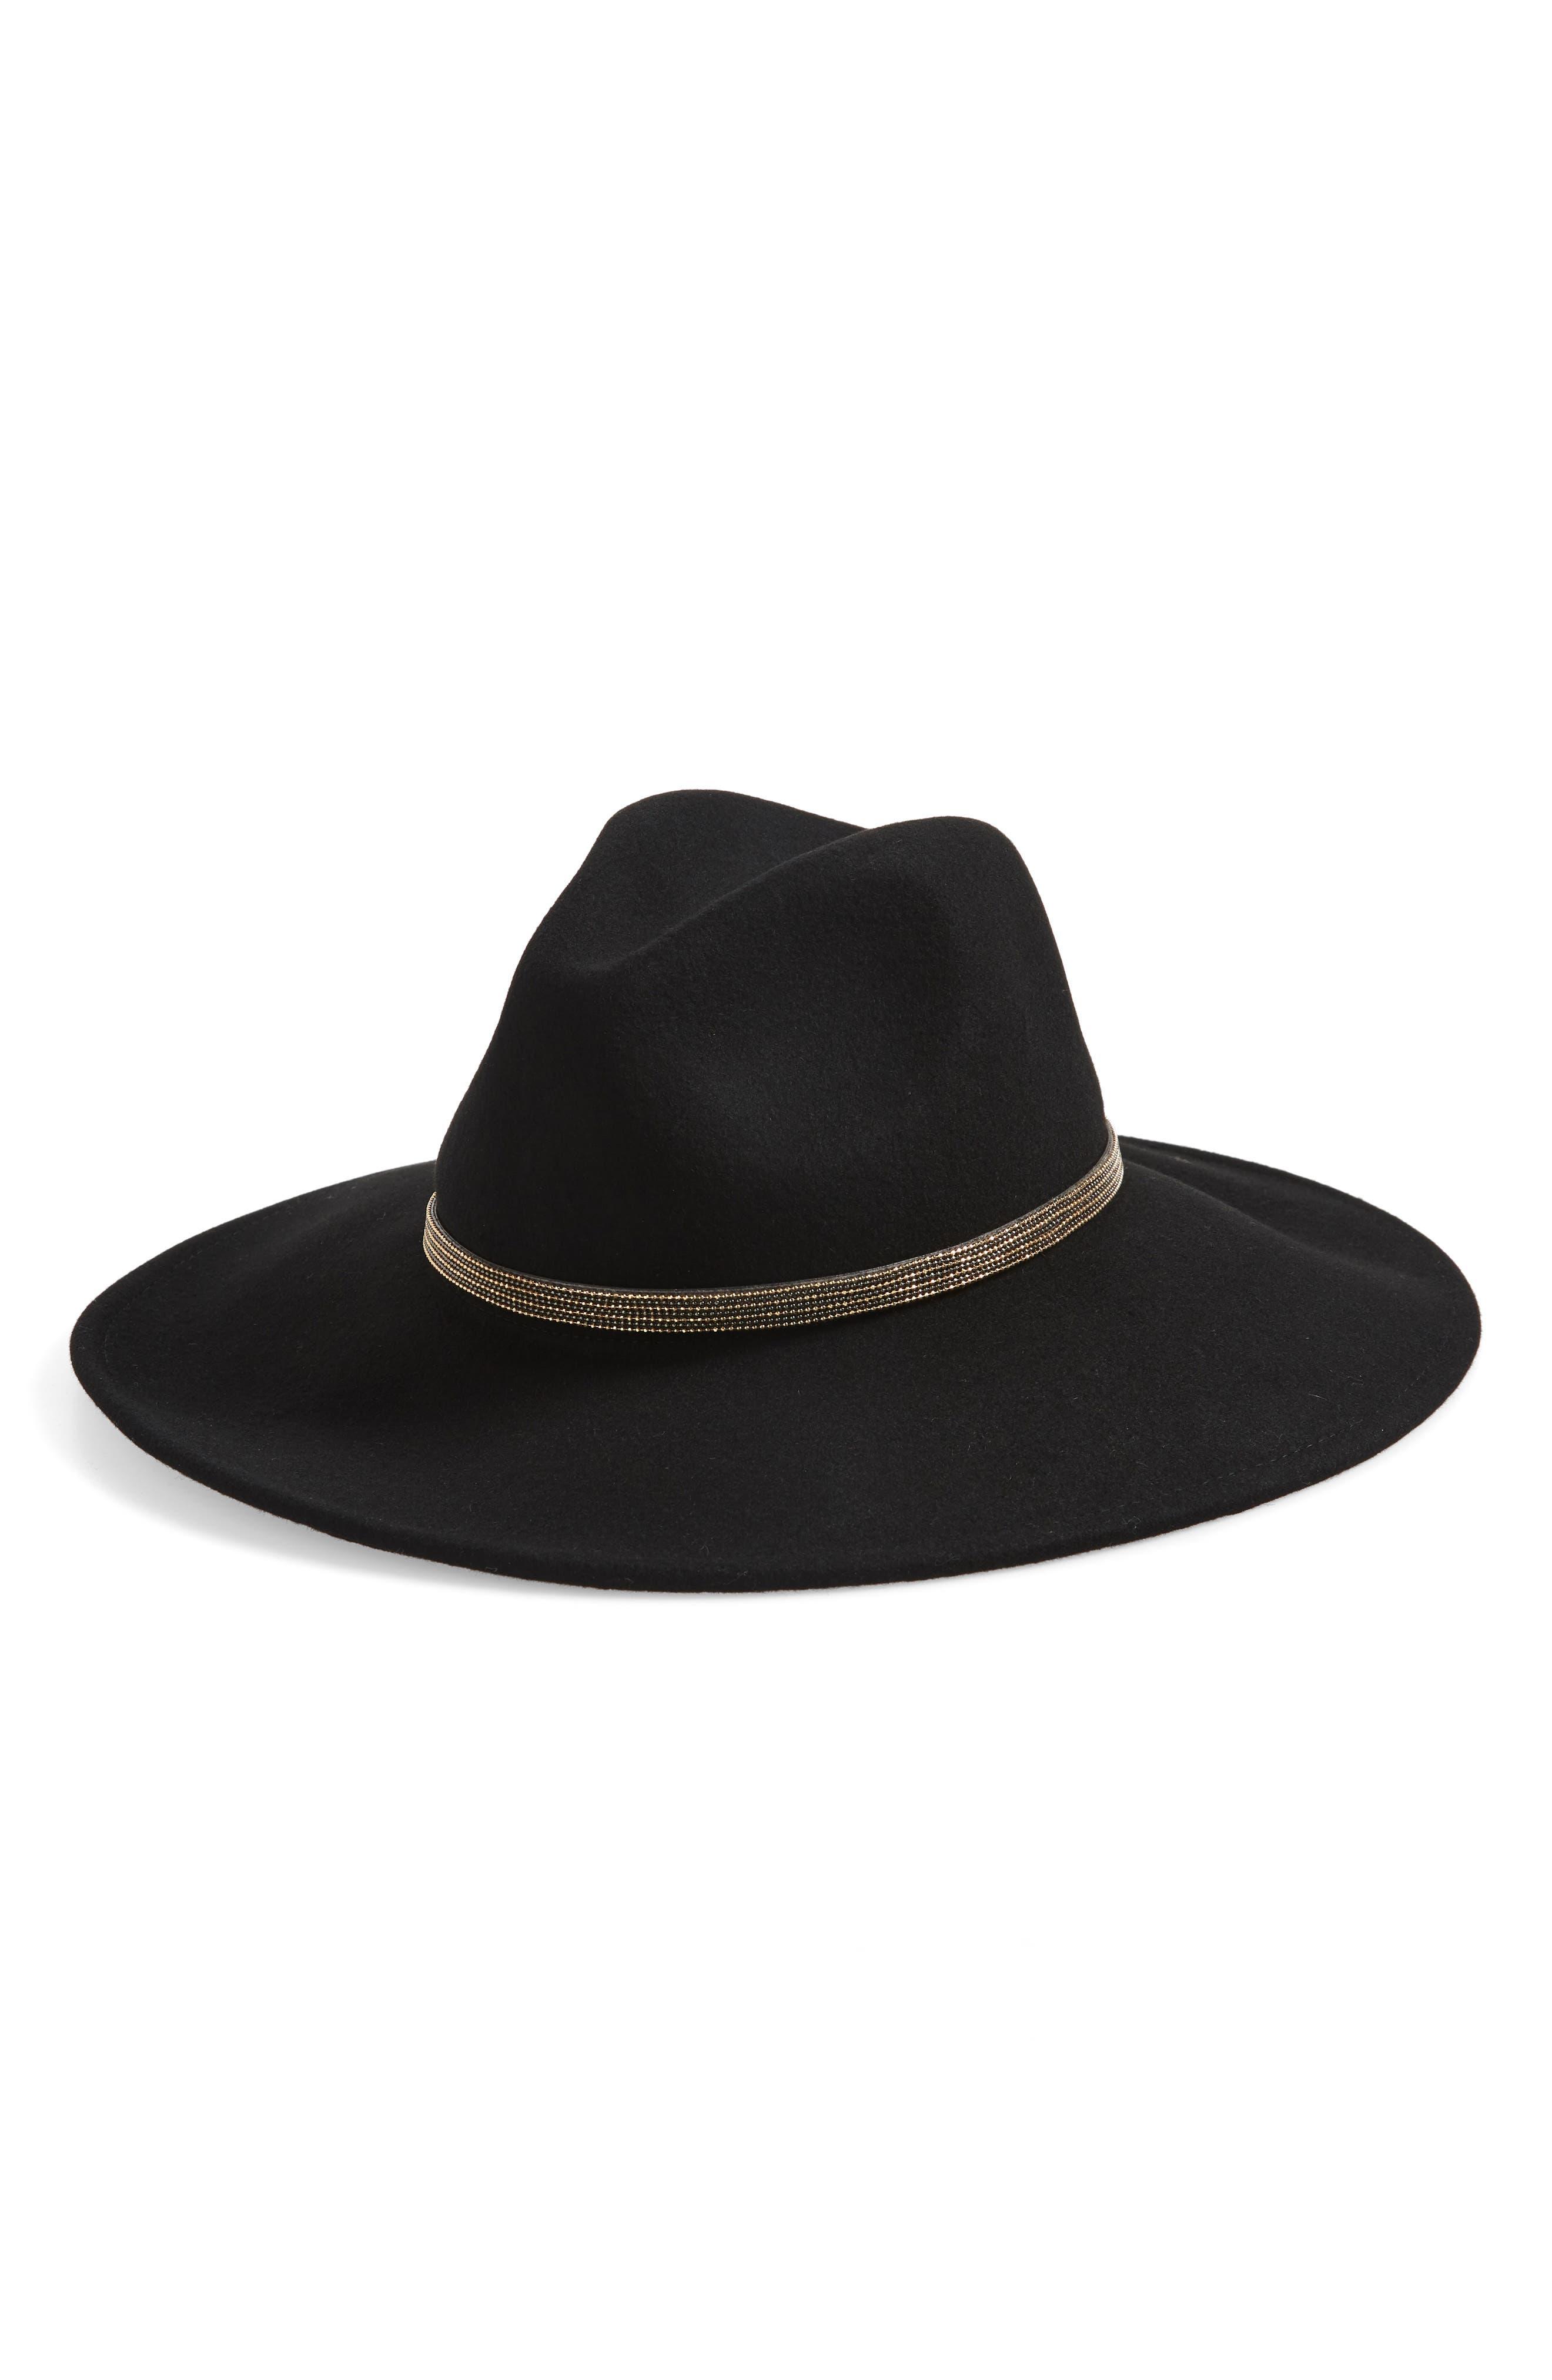 Beaded Chain Wool Felt Panama Hat,                         Main,                         color, 001